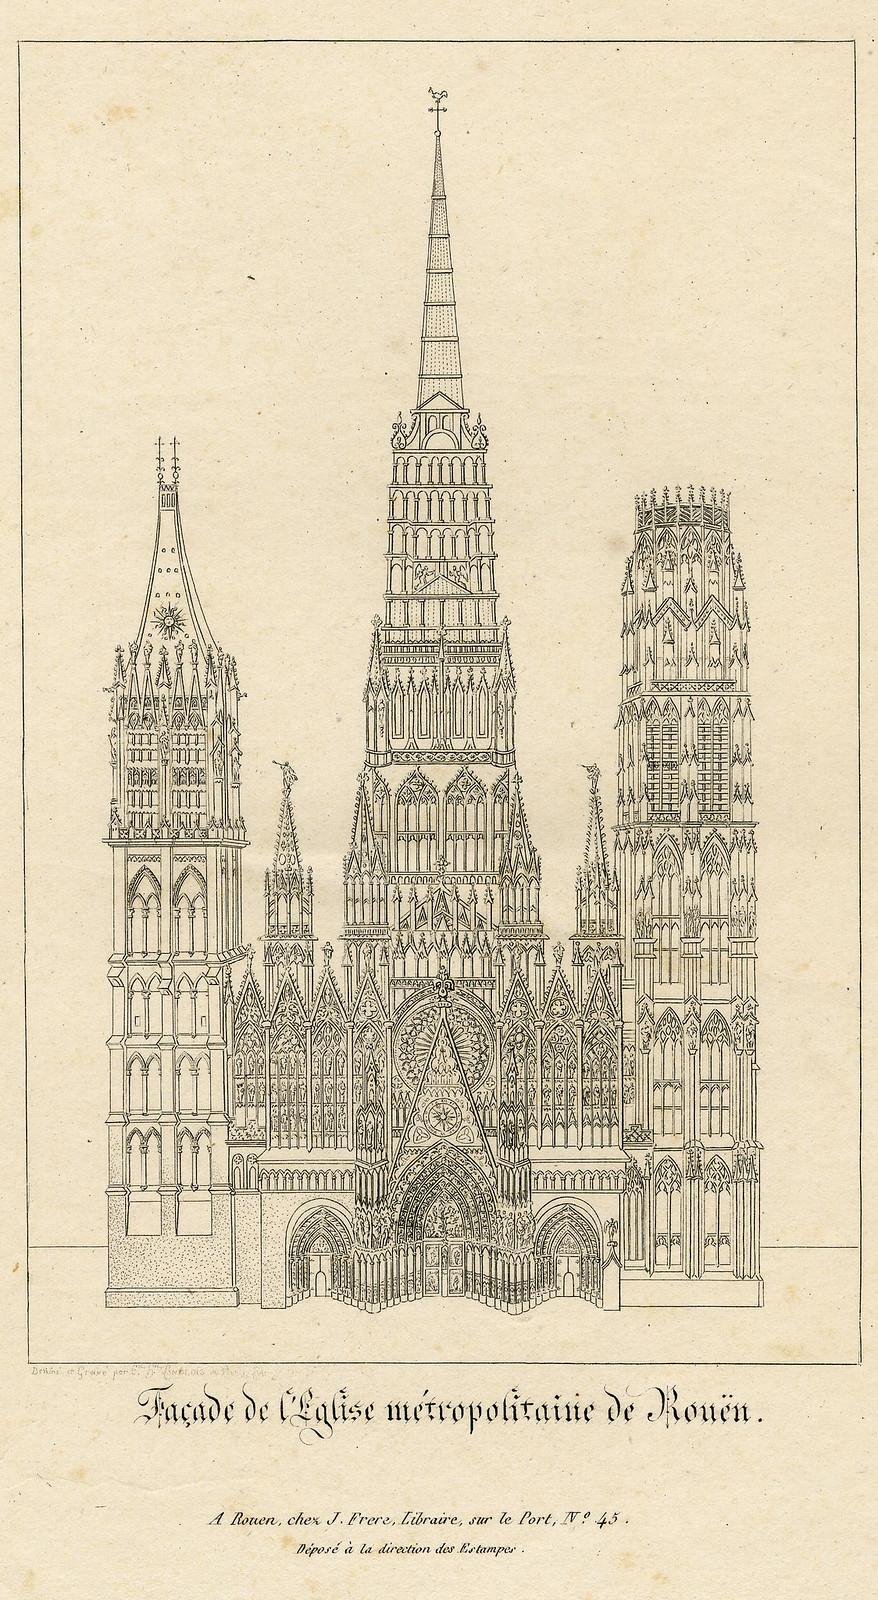 Facade de l'Eglise metropolitaine de Rouen